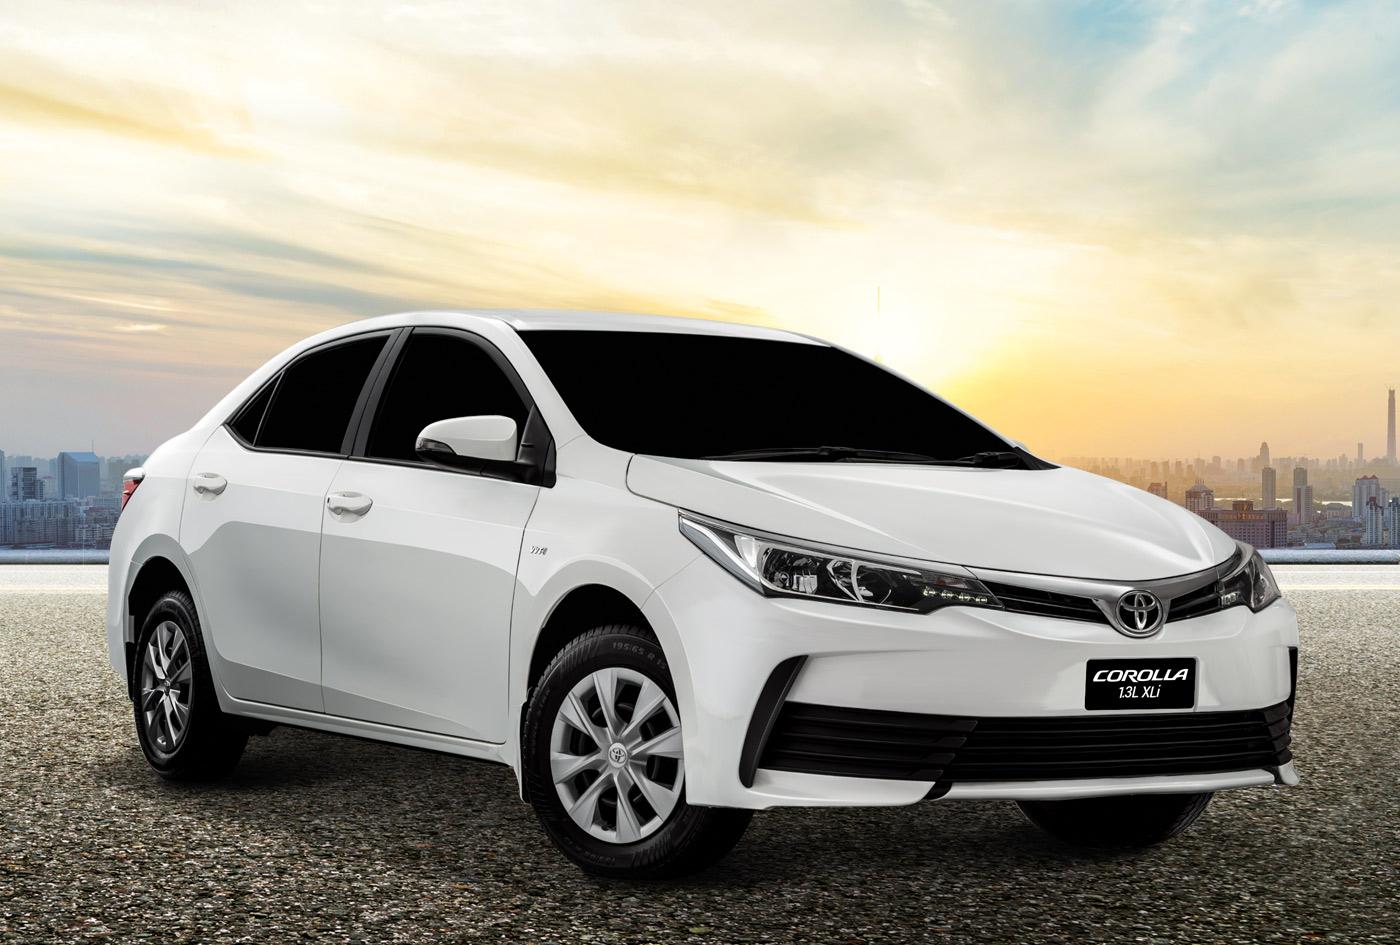 Toyota Corolla XLI vs GLI 2017 Pakistan